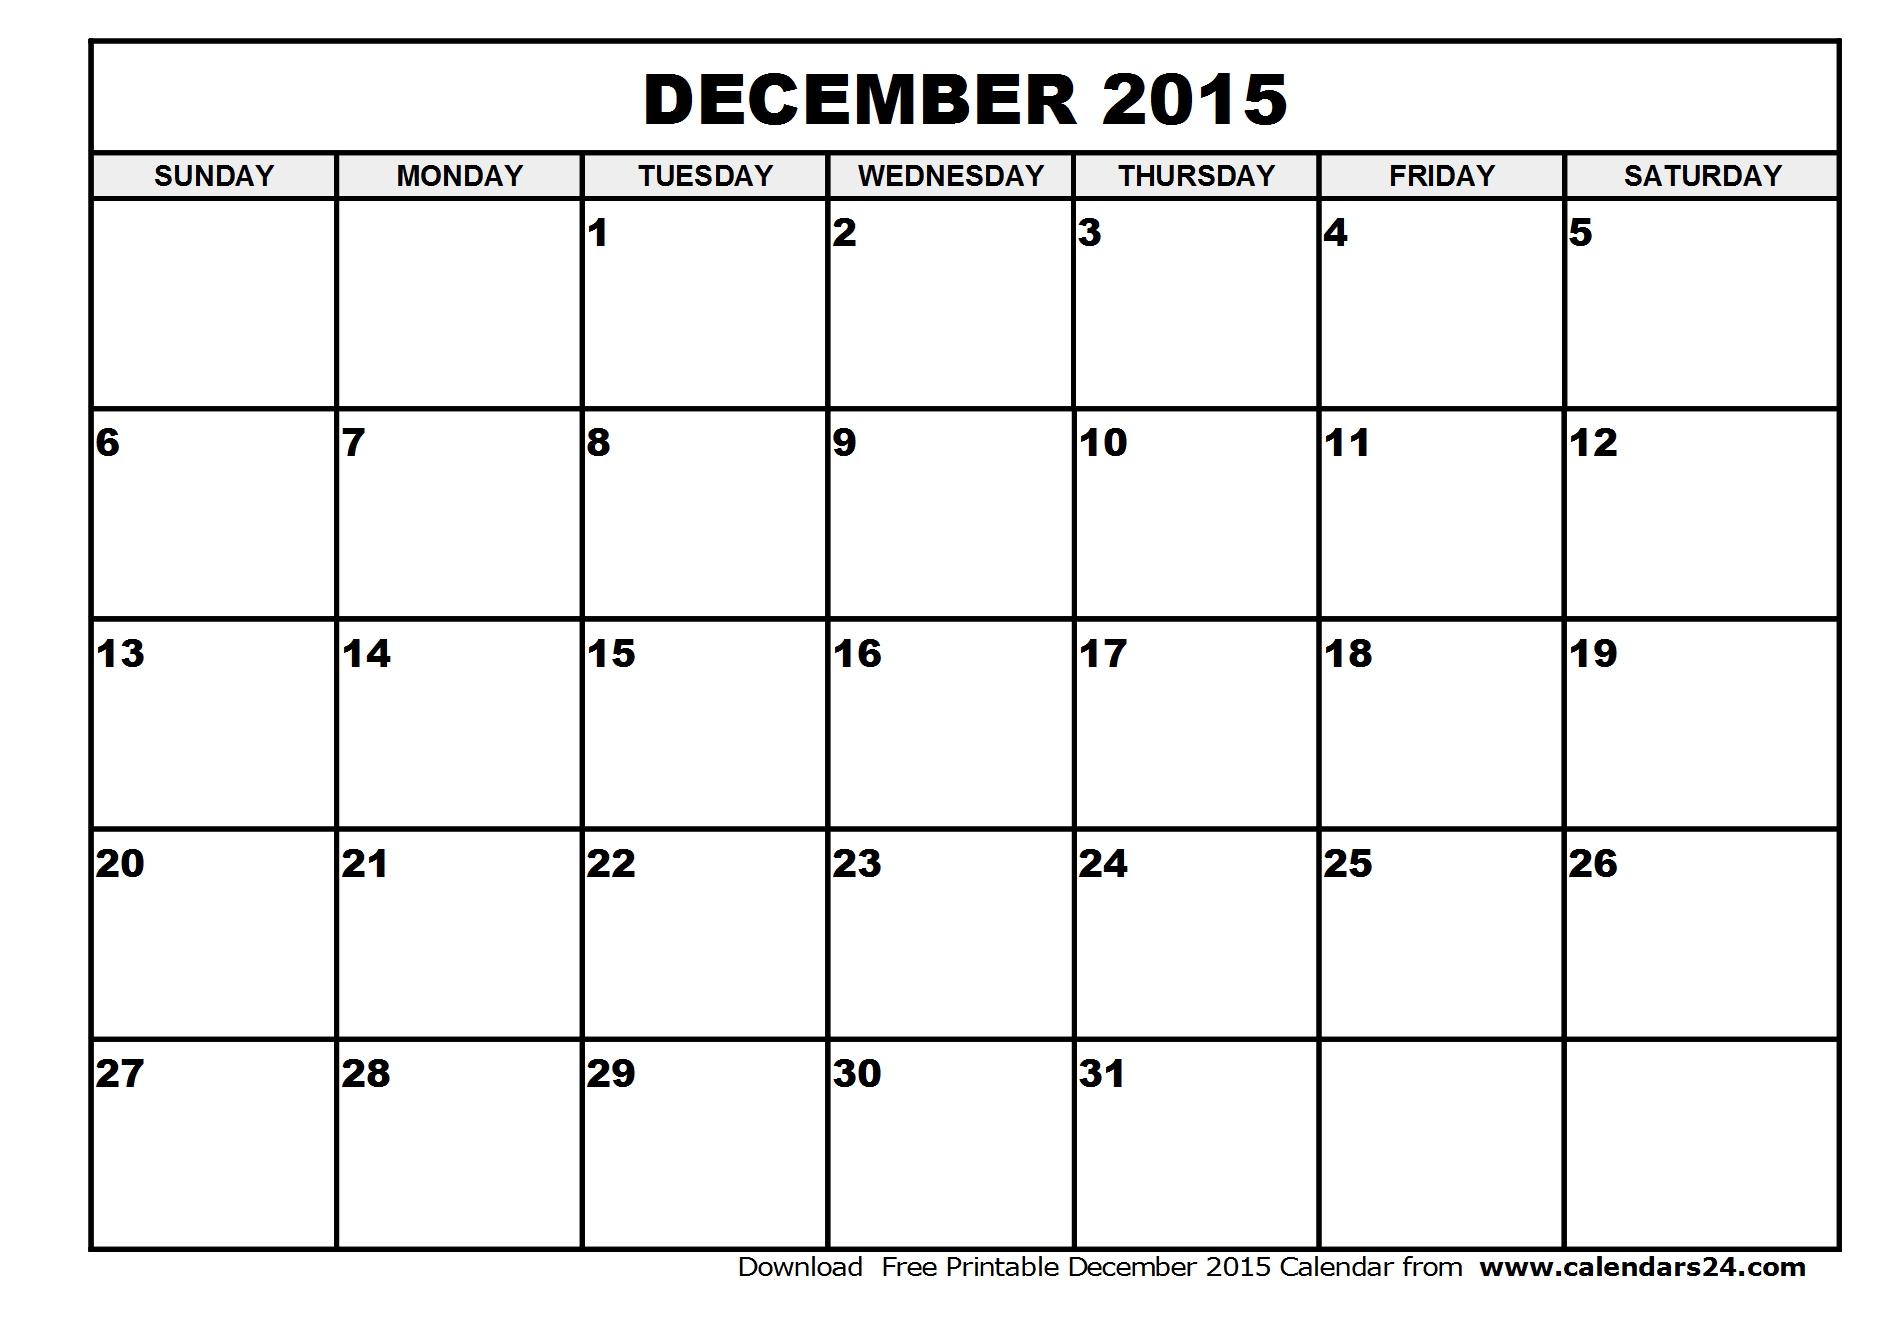 Monthly calendar november 2016 clipart png free download Calendar template|Printable Calendar|Download Calendar Free | pages 3 png free download